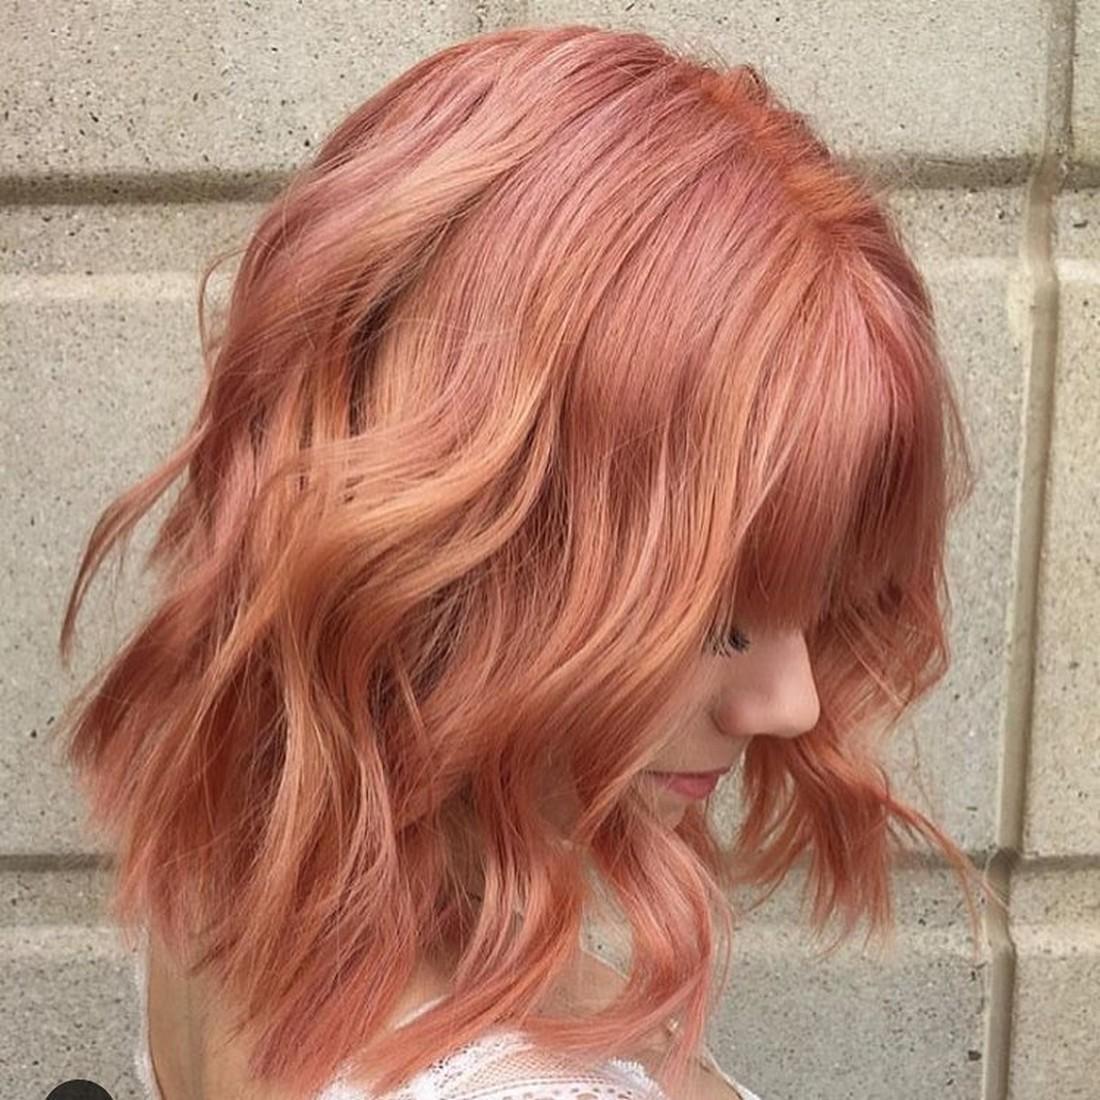 Окрашивание волос блоранж | 9